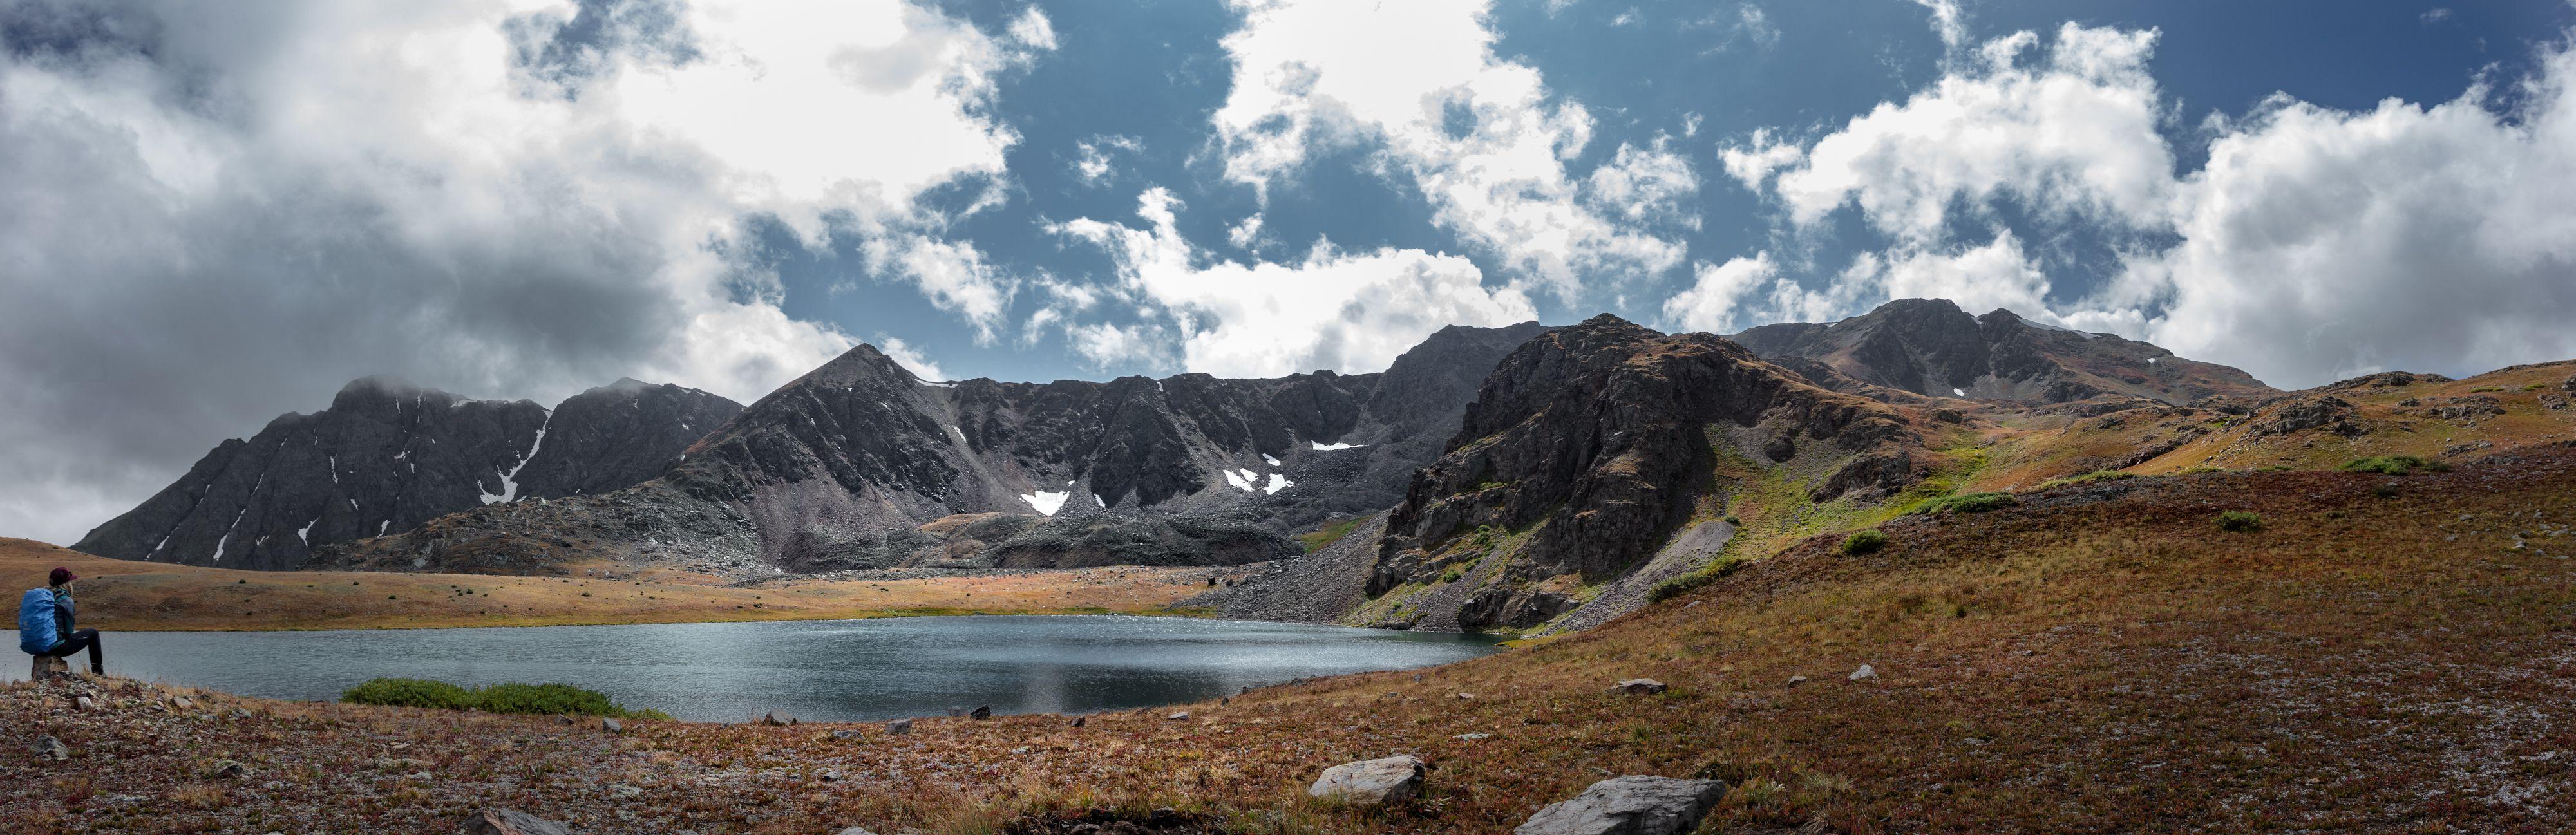 Petroleum Lake, Colorado